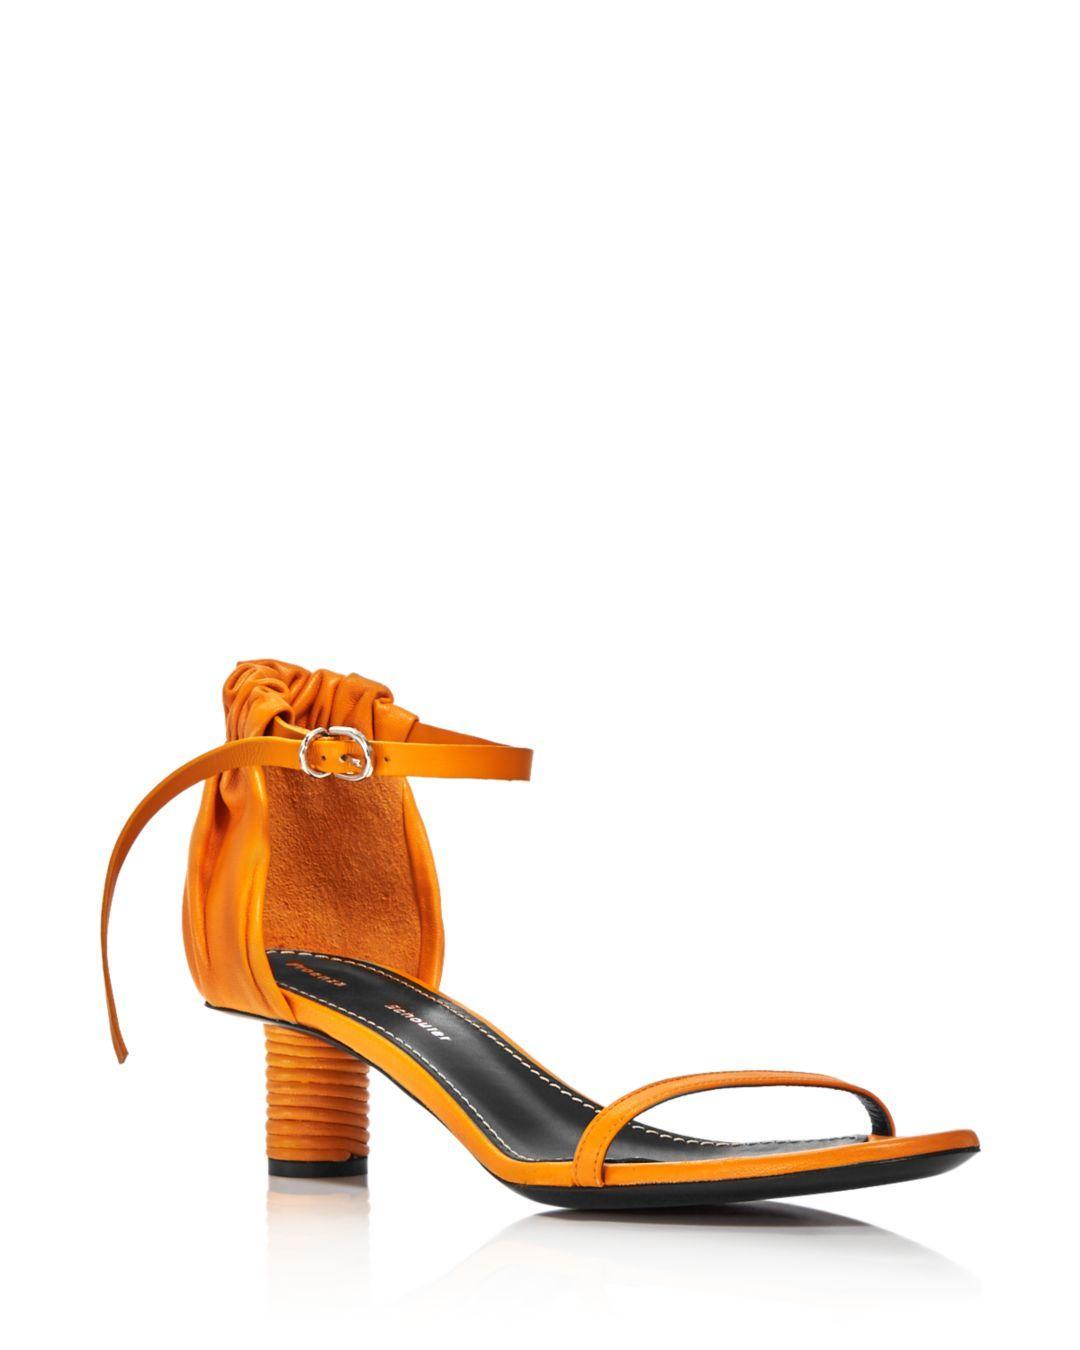 04f43b885a5 Lyst - Proenza Schouler Women s Ruffled Round Heel Sandals in Yellow